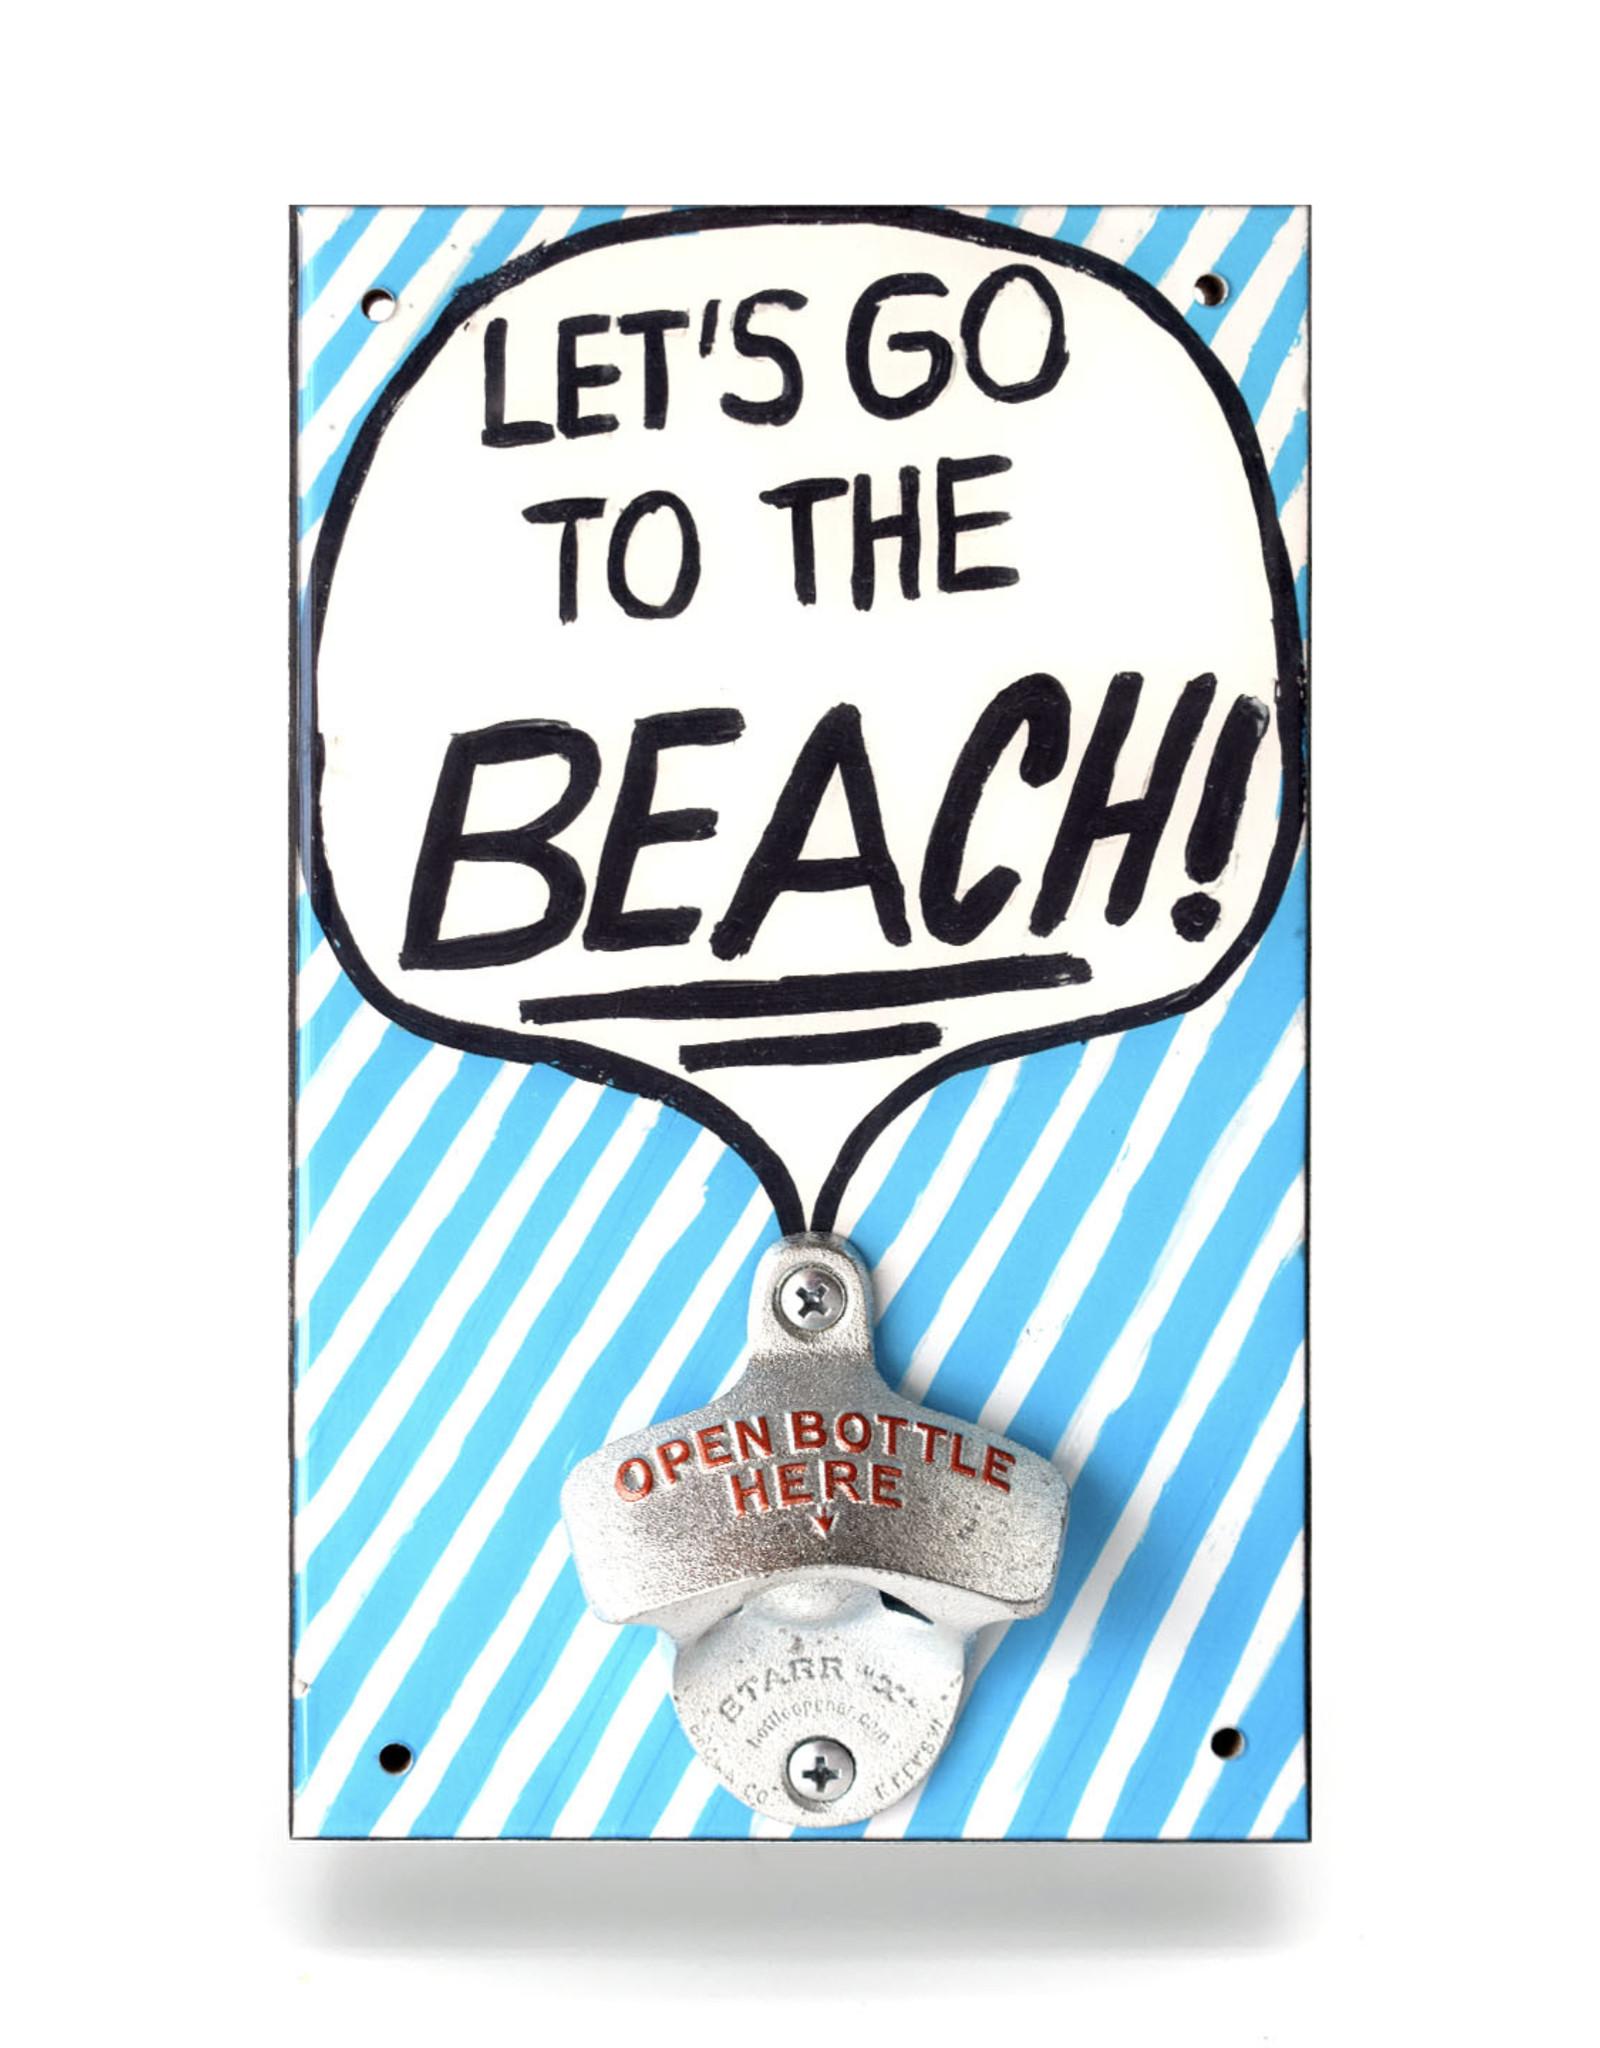 Let's Go to the Beach Bottle Opener